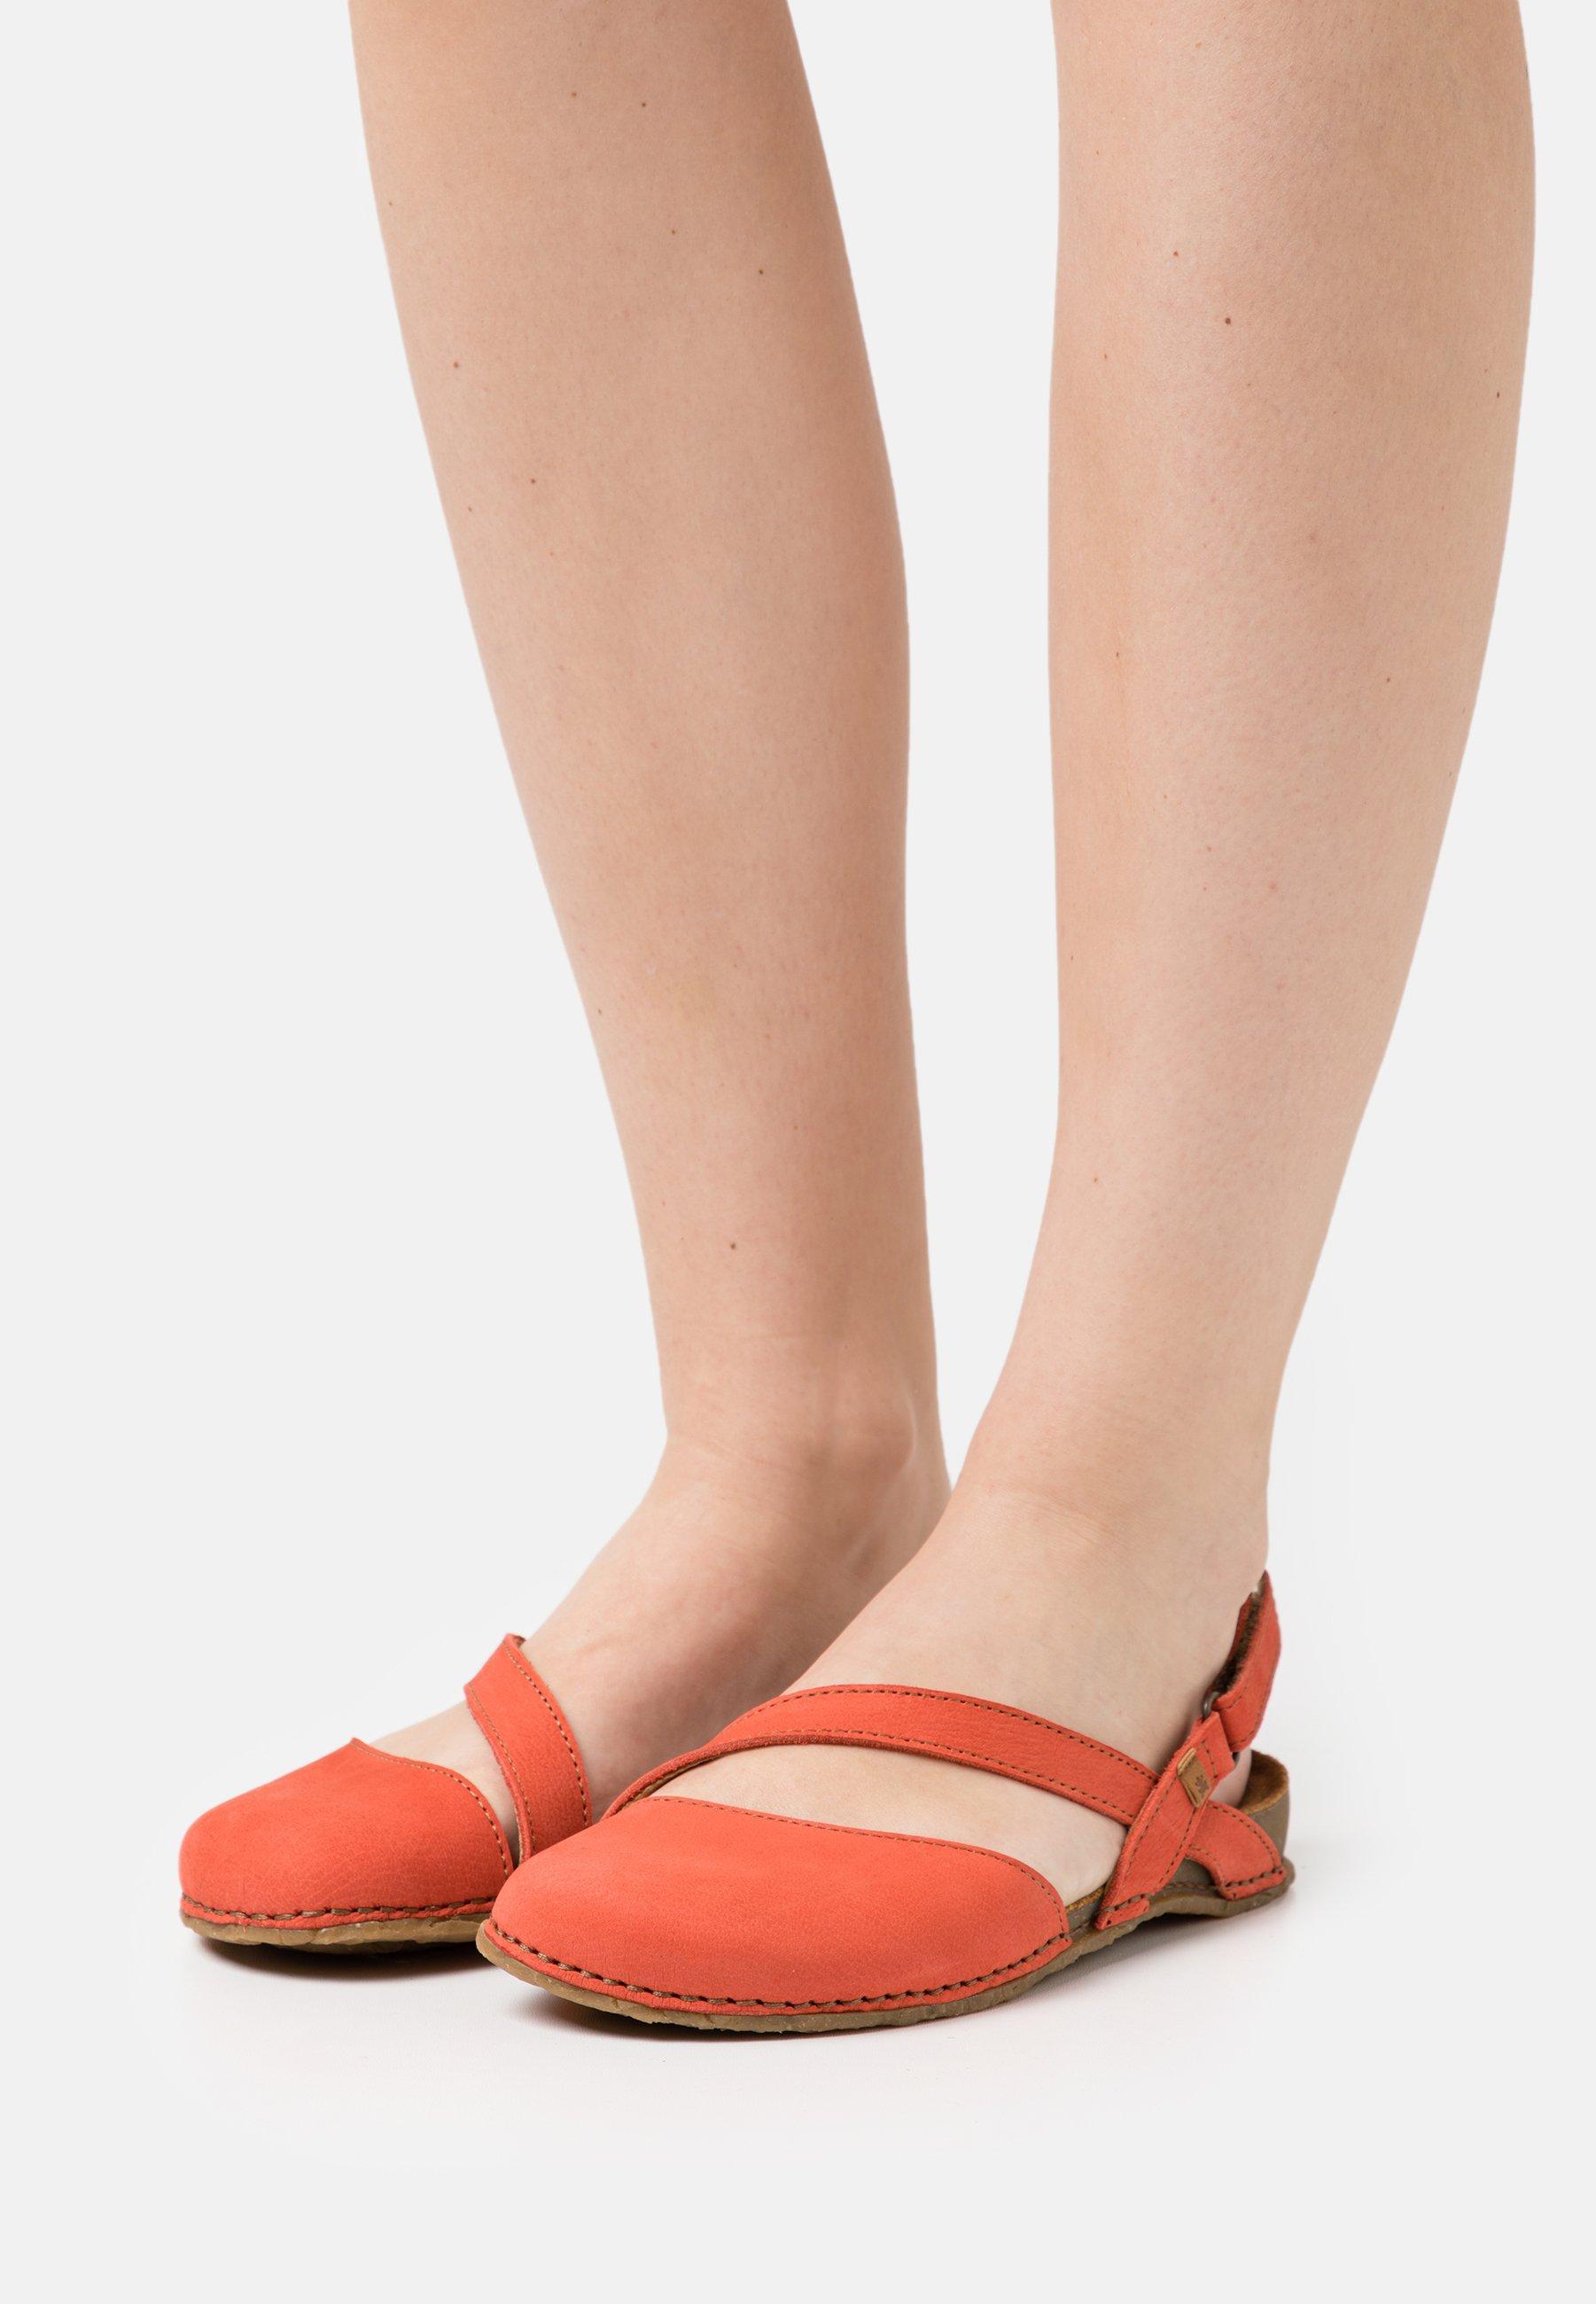 Women PANGLAO - Slingback ballet pumps